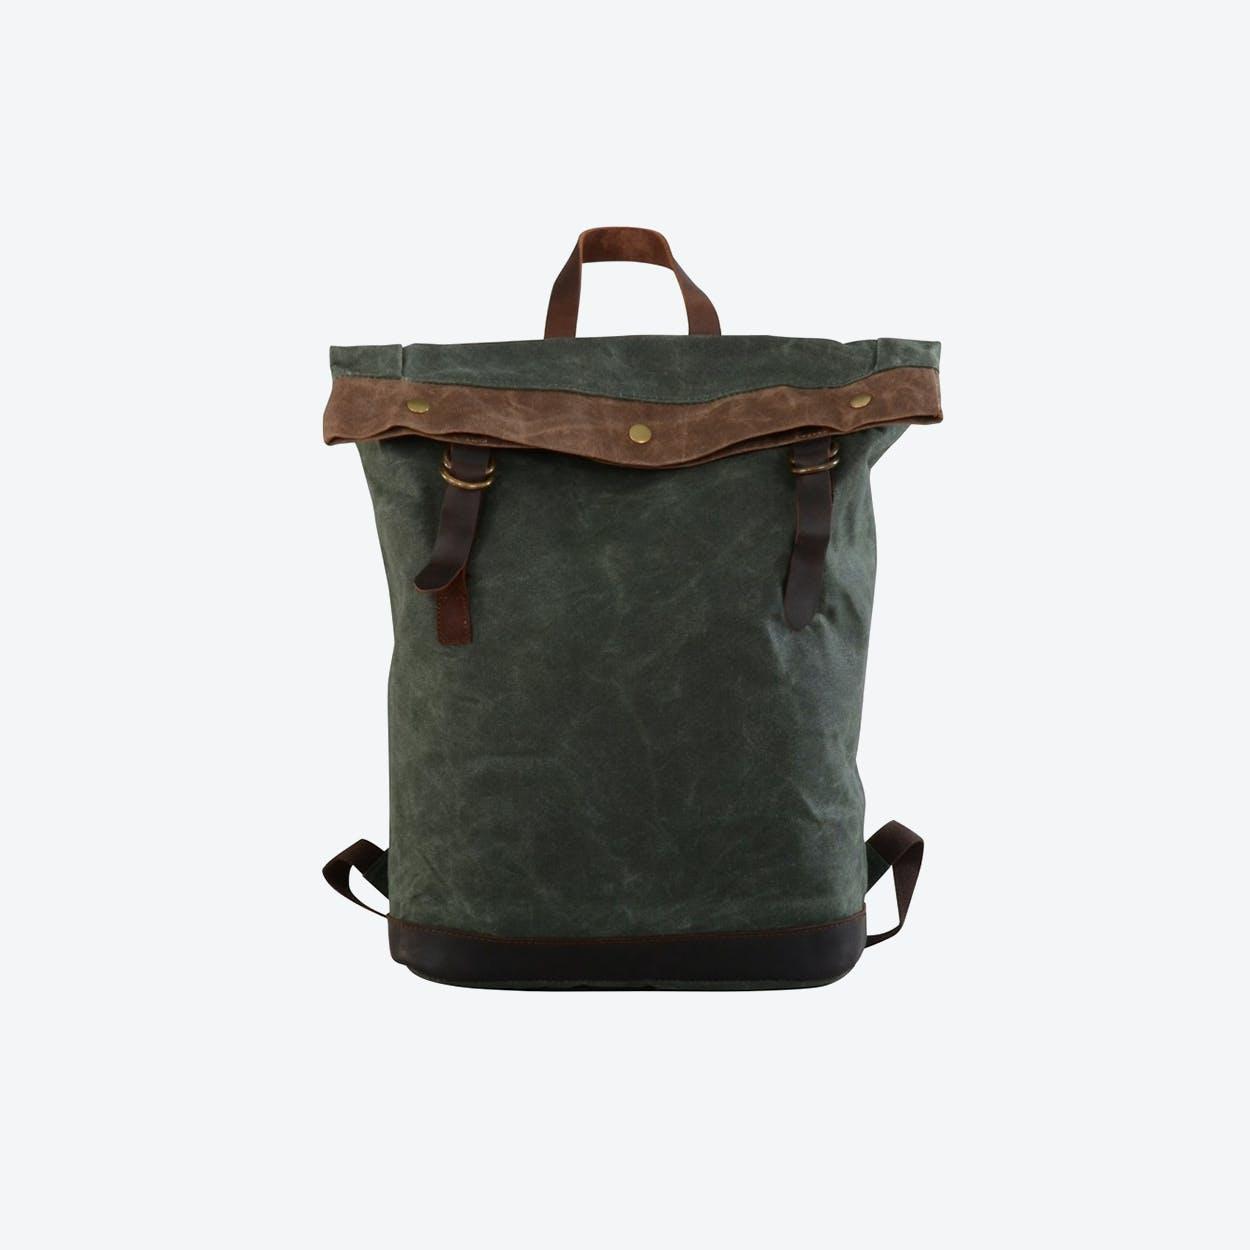 Waxed Canvas Bucket Backpack in Teal